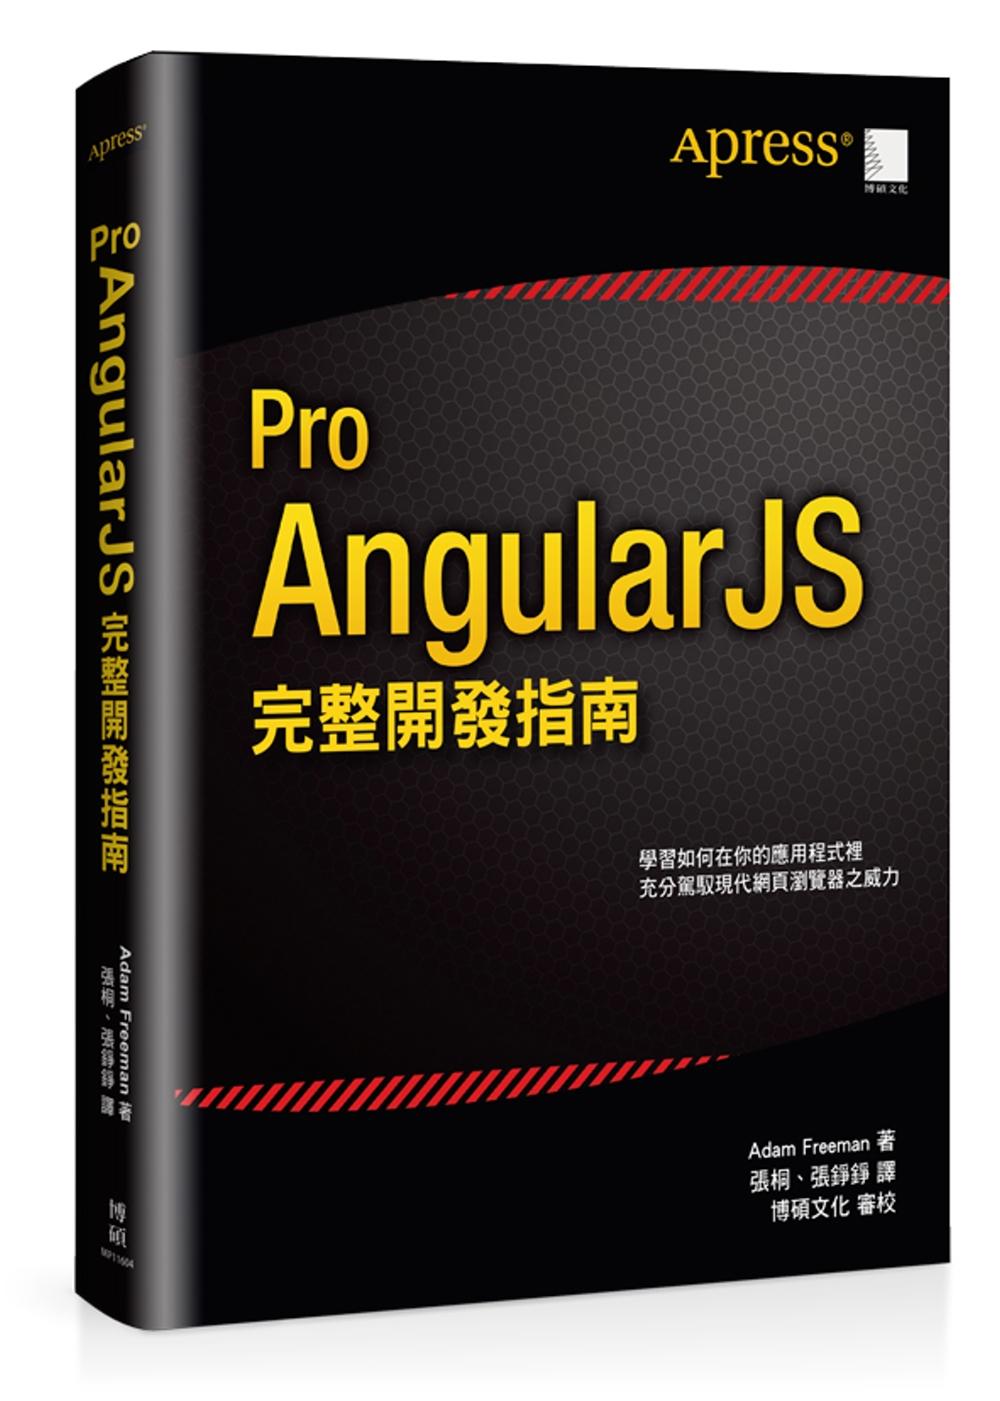 Pro AngularJS 完整開發指南